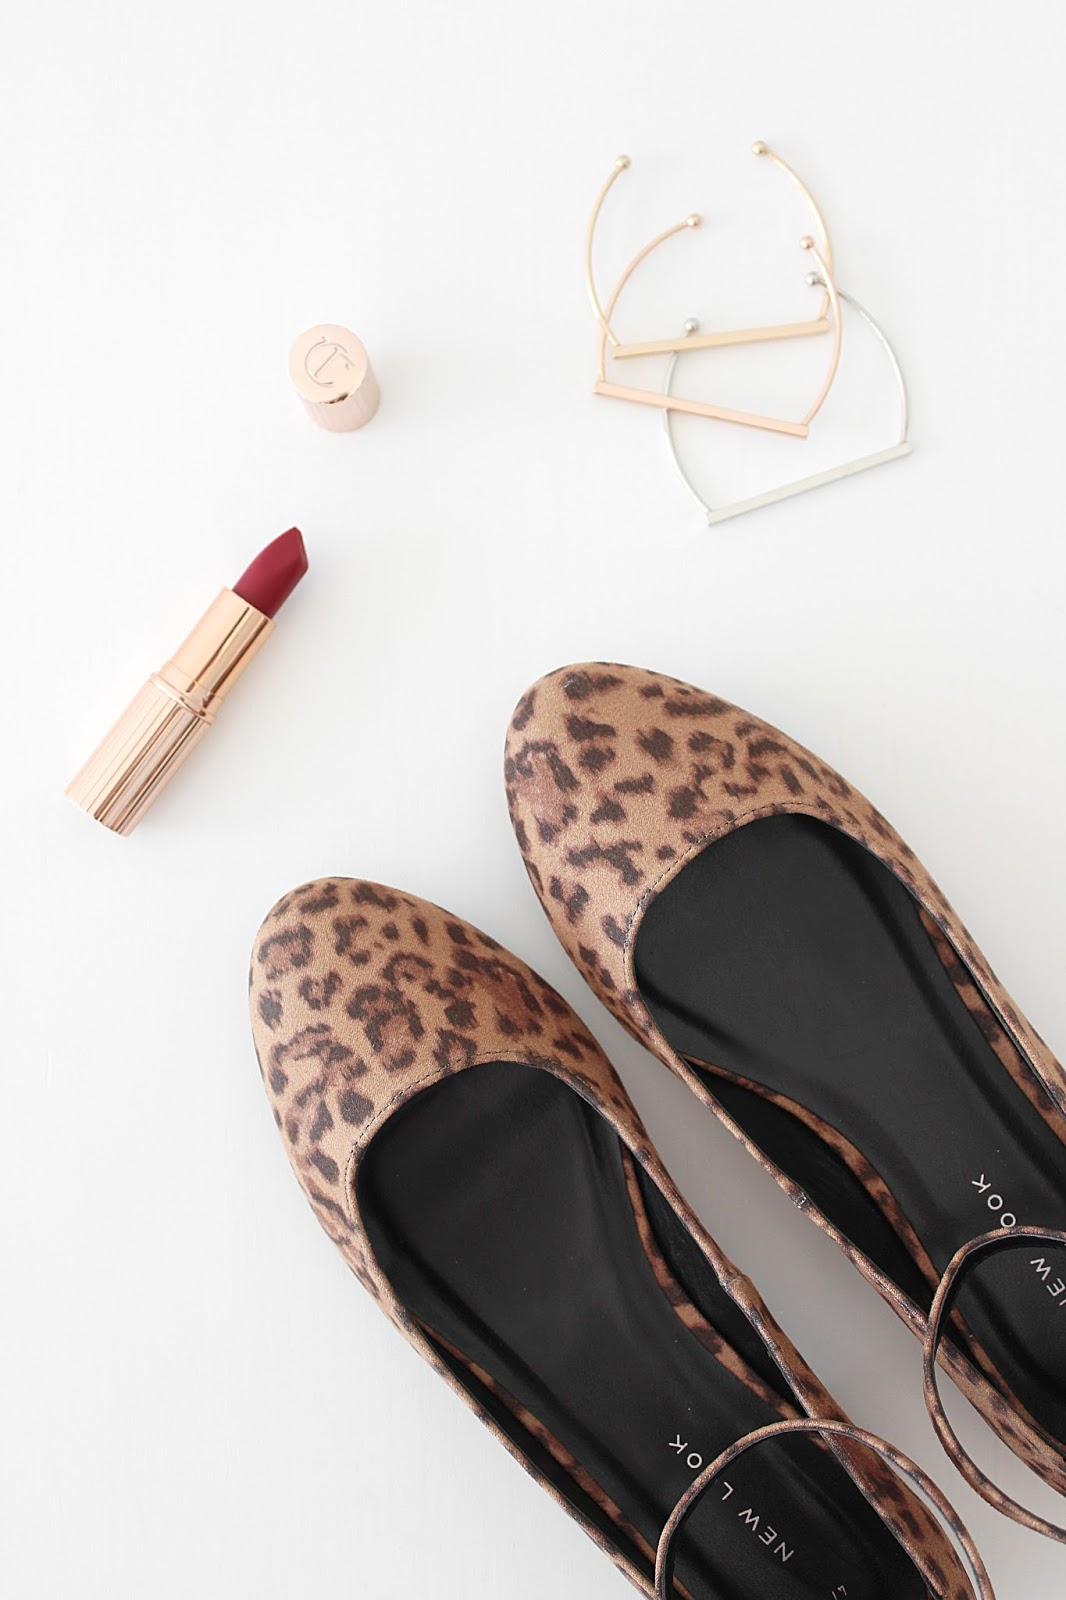 ASOS Haul - New Look Leopard Ballet Flats